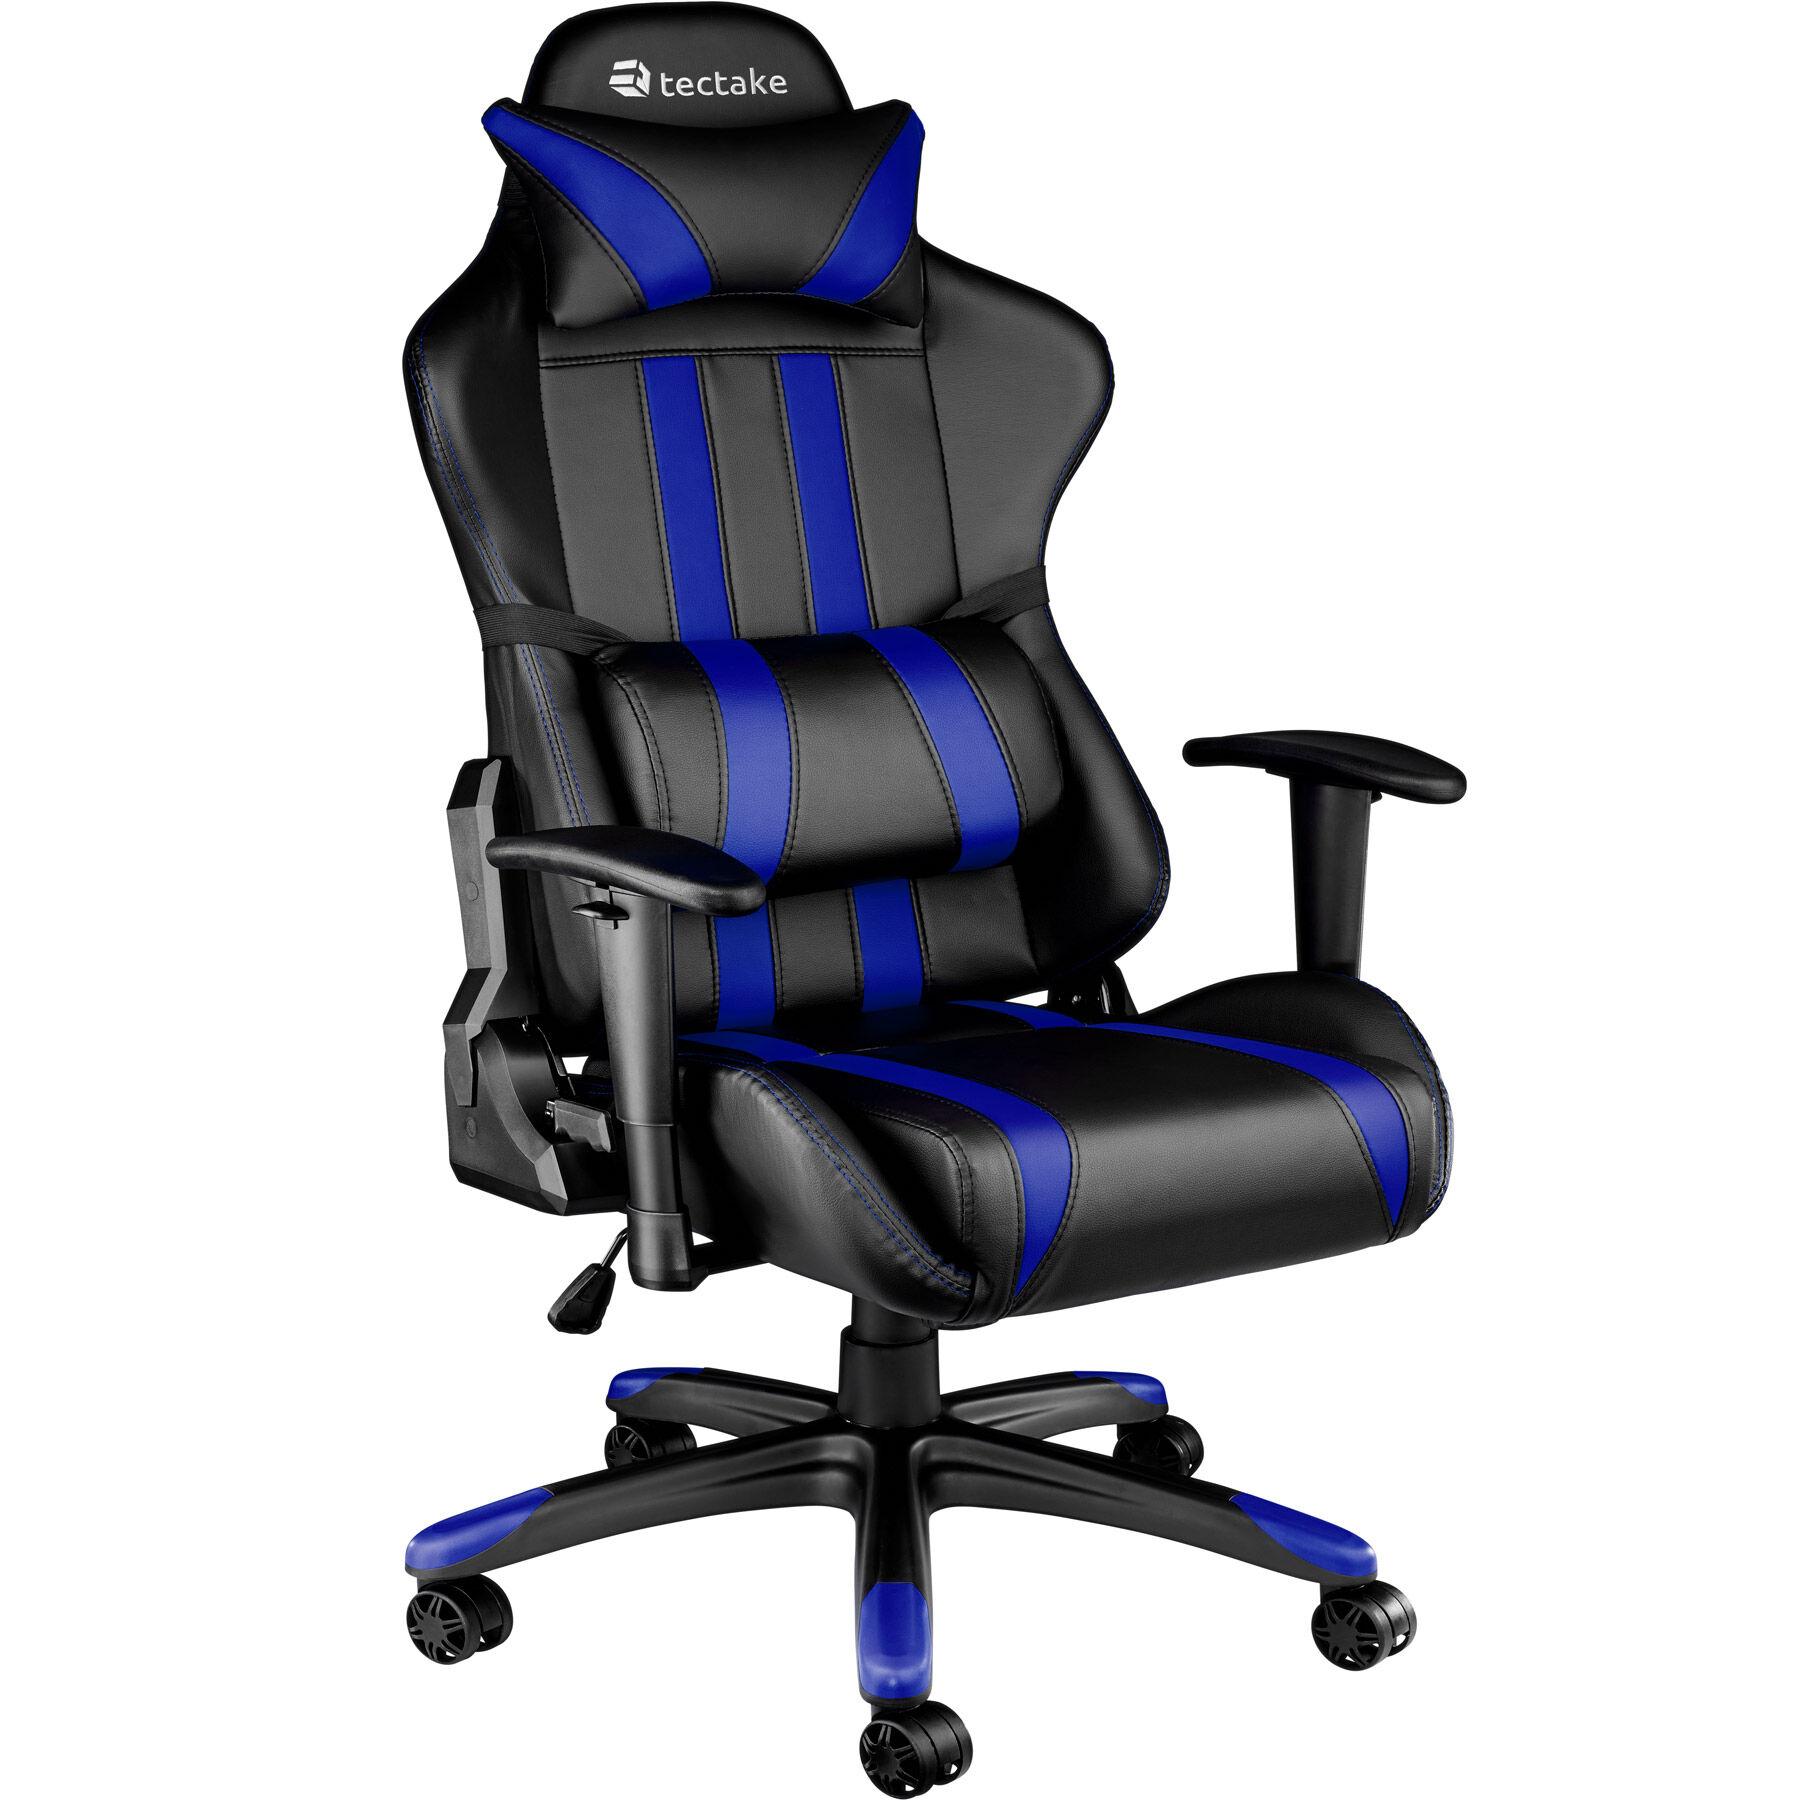 tectake Gaming chair premium - black/blue